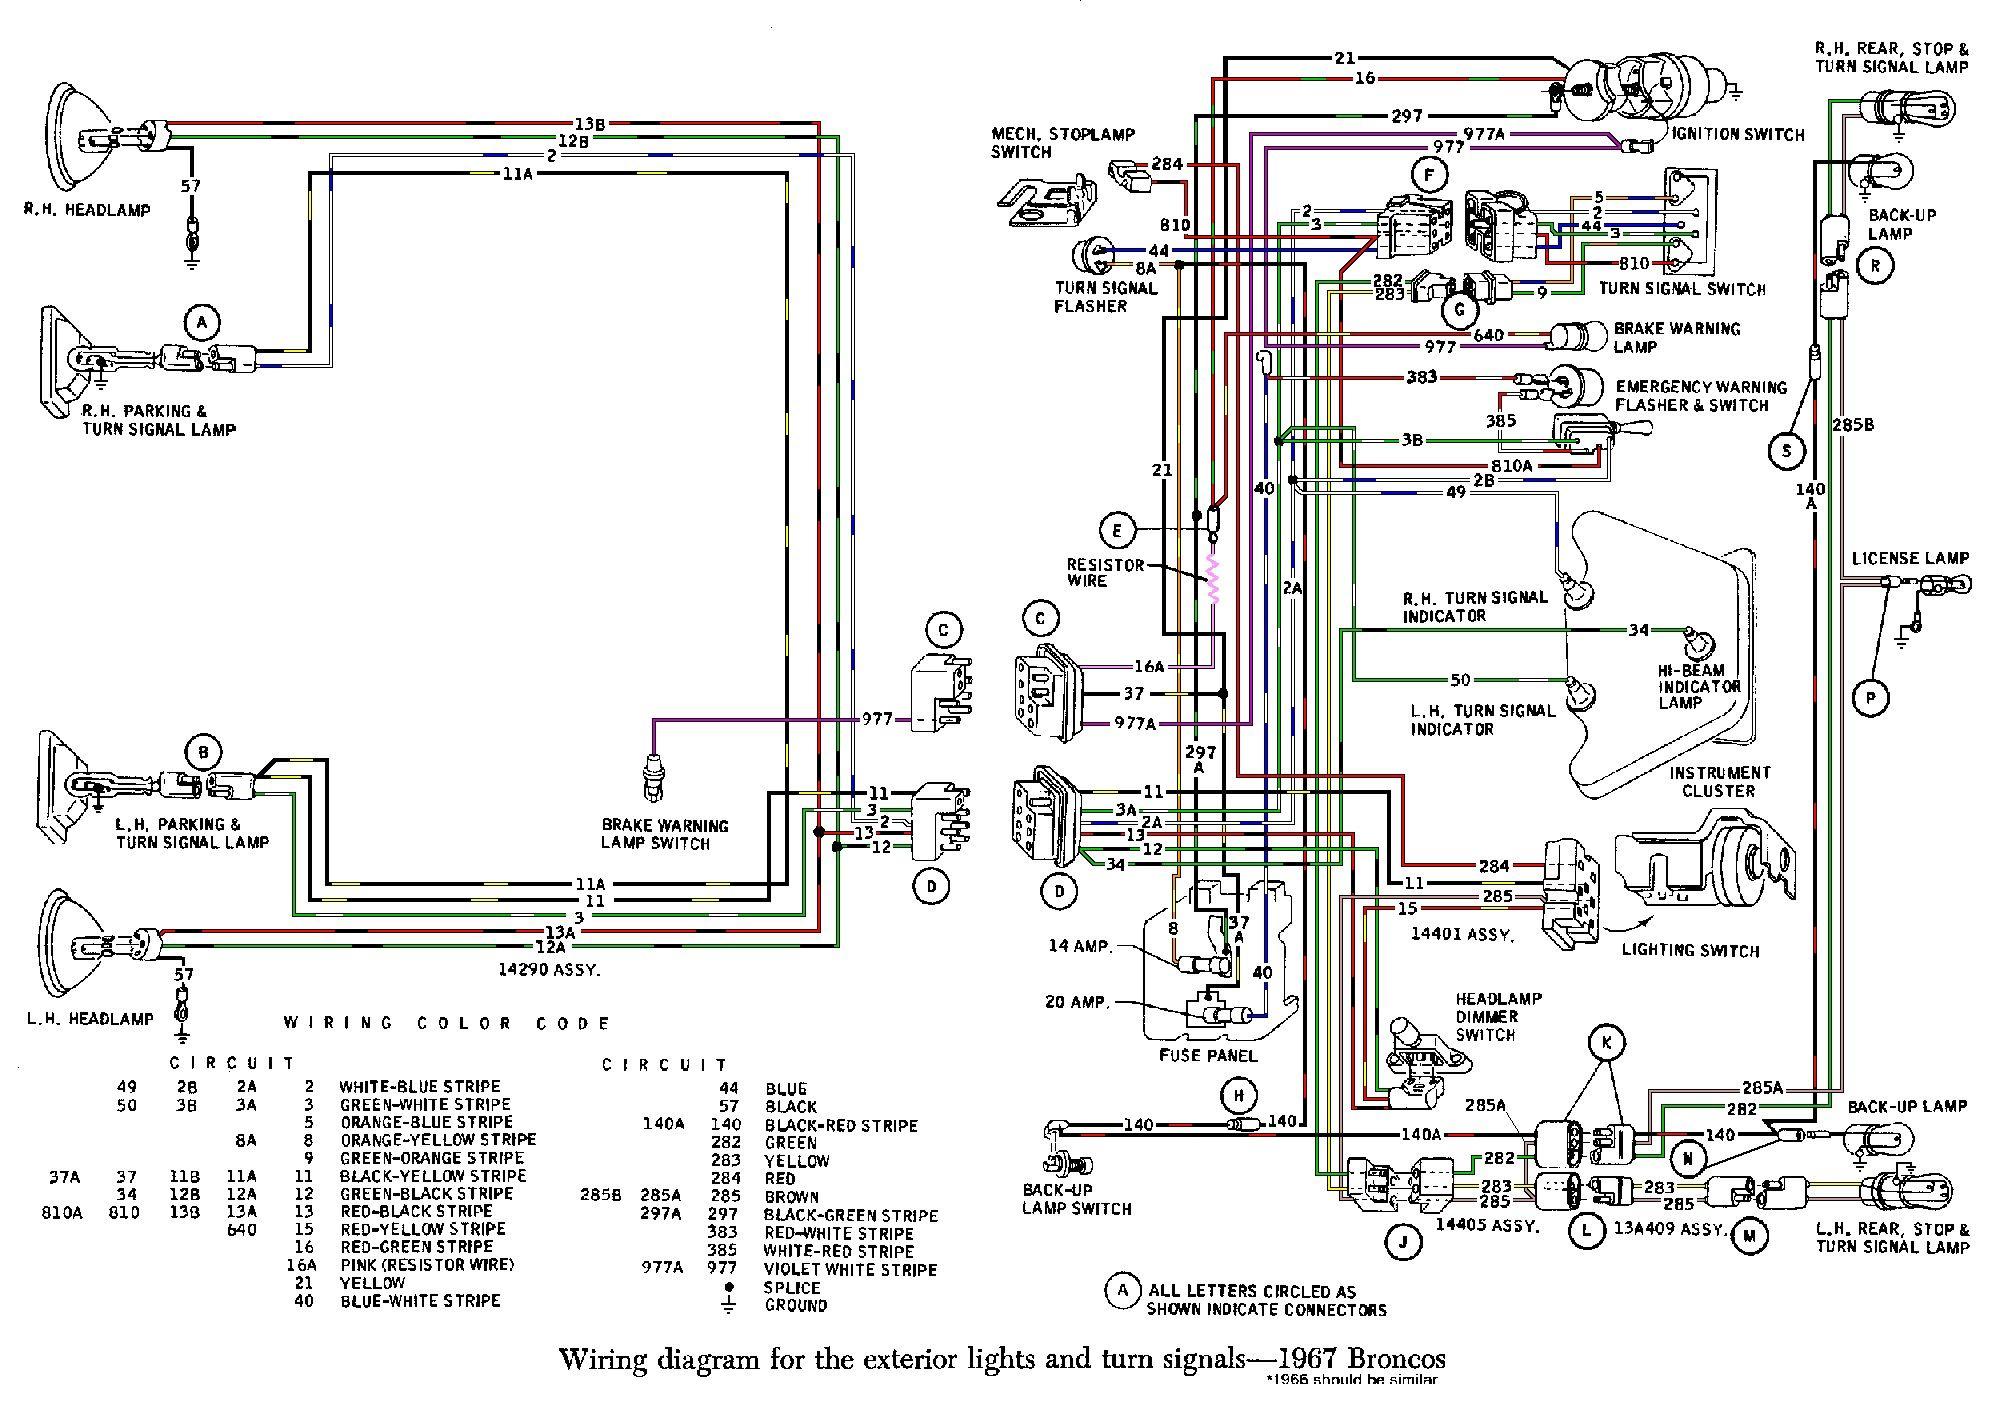 Freightliner 2013 Brake Light Wiring In 2021 Wiring Diagram Diagram Freightliner